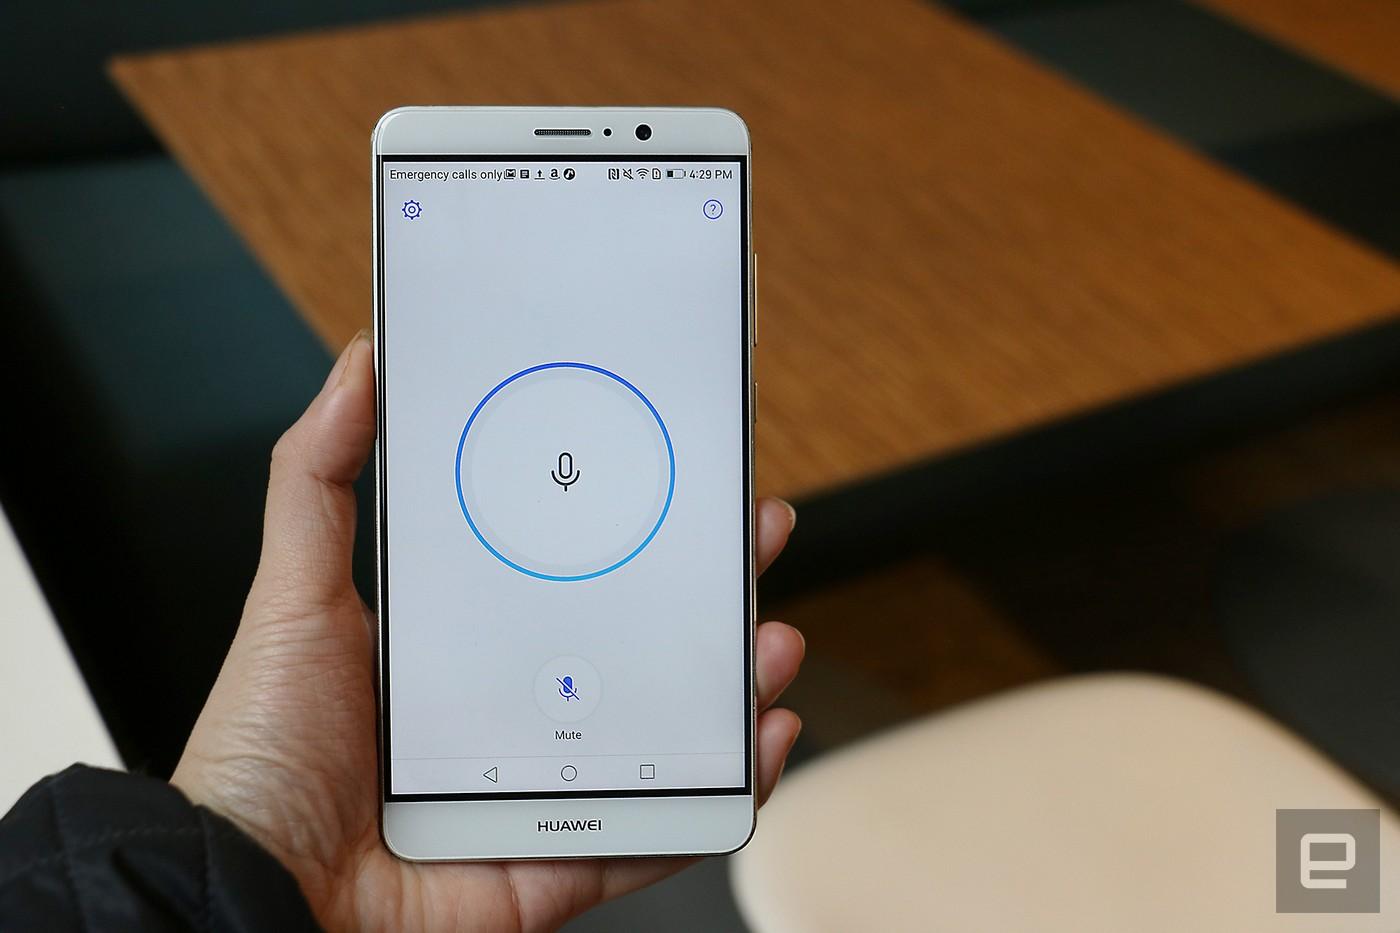 Alexa on the Huawei Mate 9 isn't worth the effort (yet)